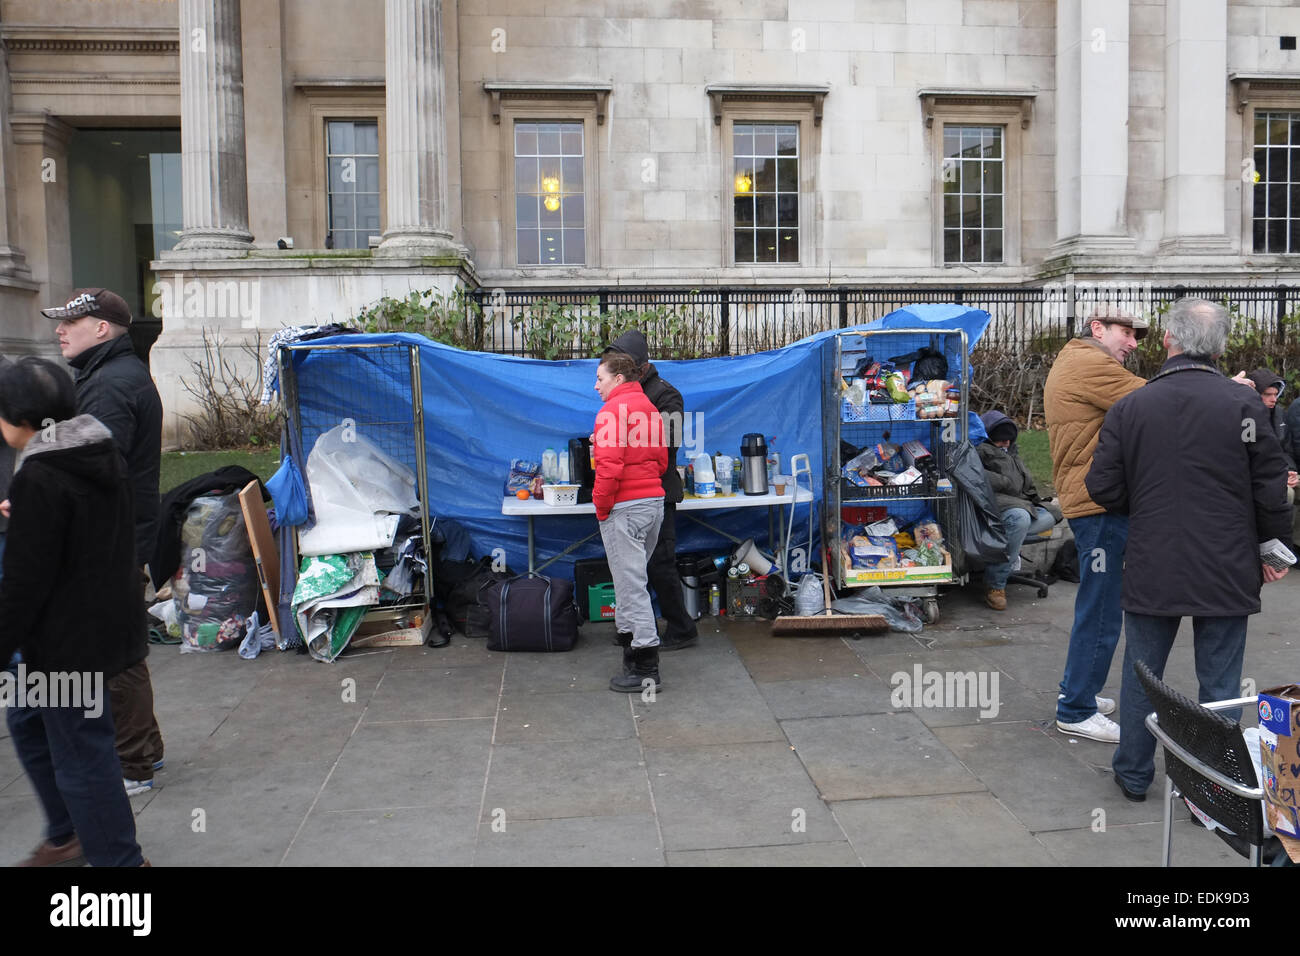 Trafalgar Square, London, UK. 7th January 2015. Squatters evicted from the bank near Trafalgar Square have set up Stock Photo